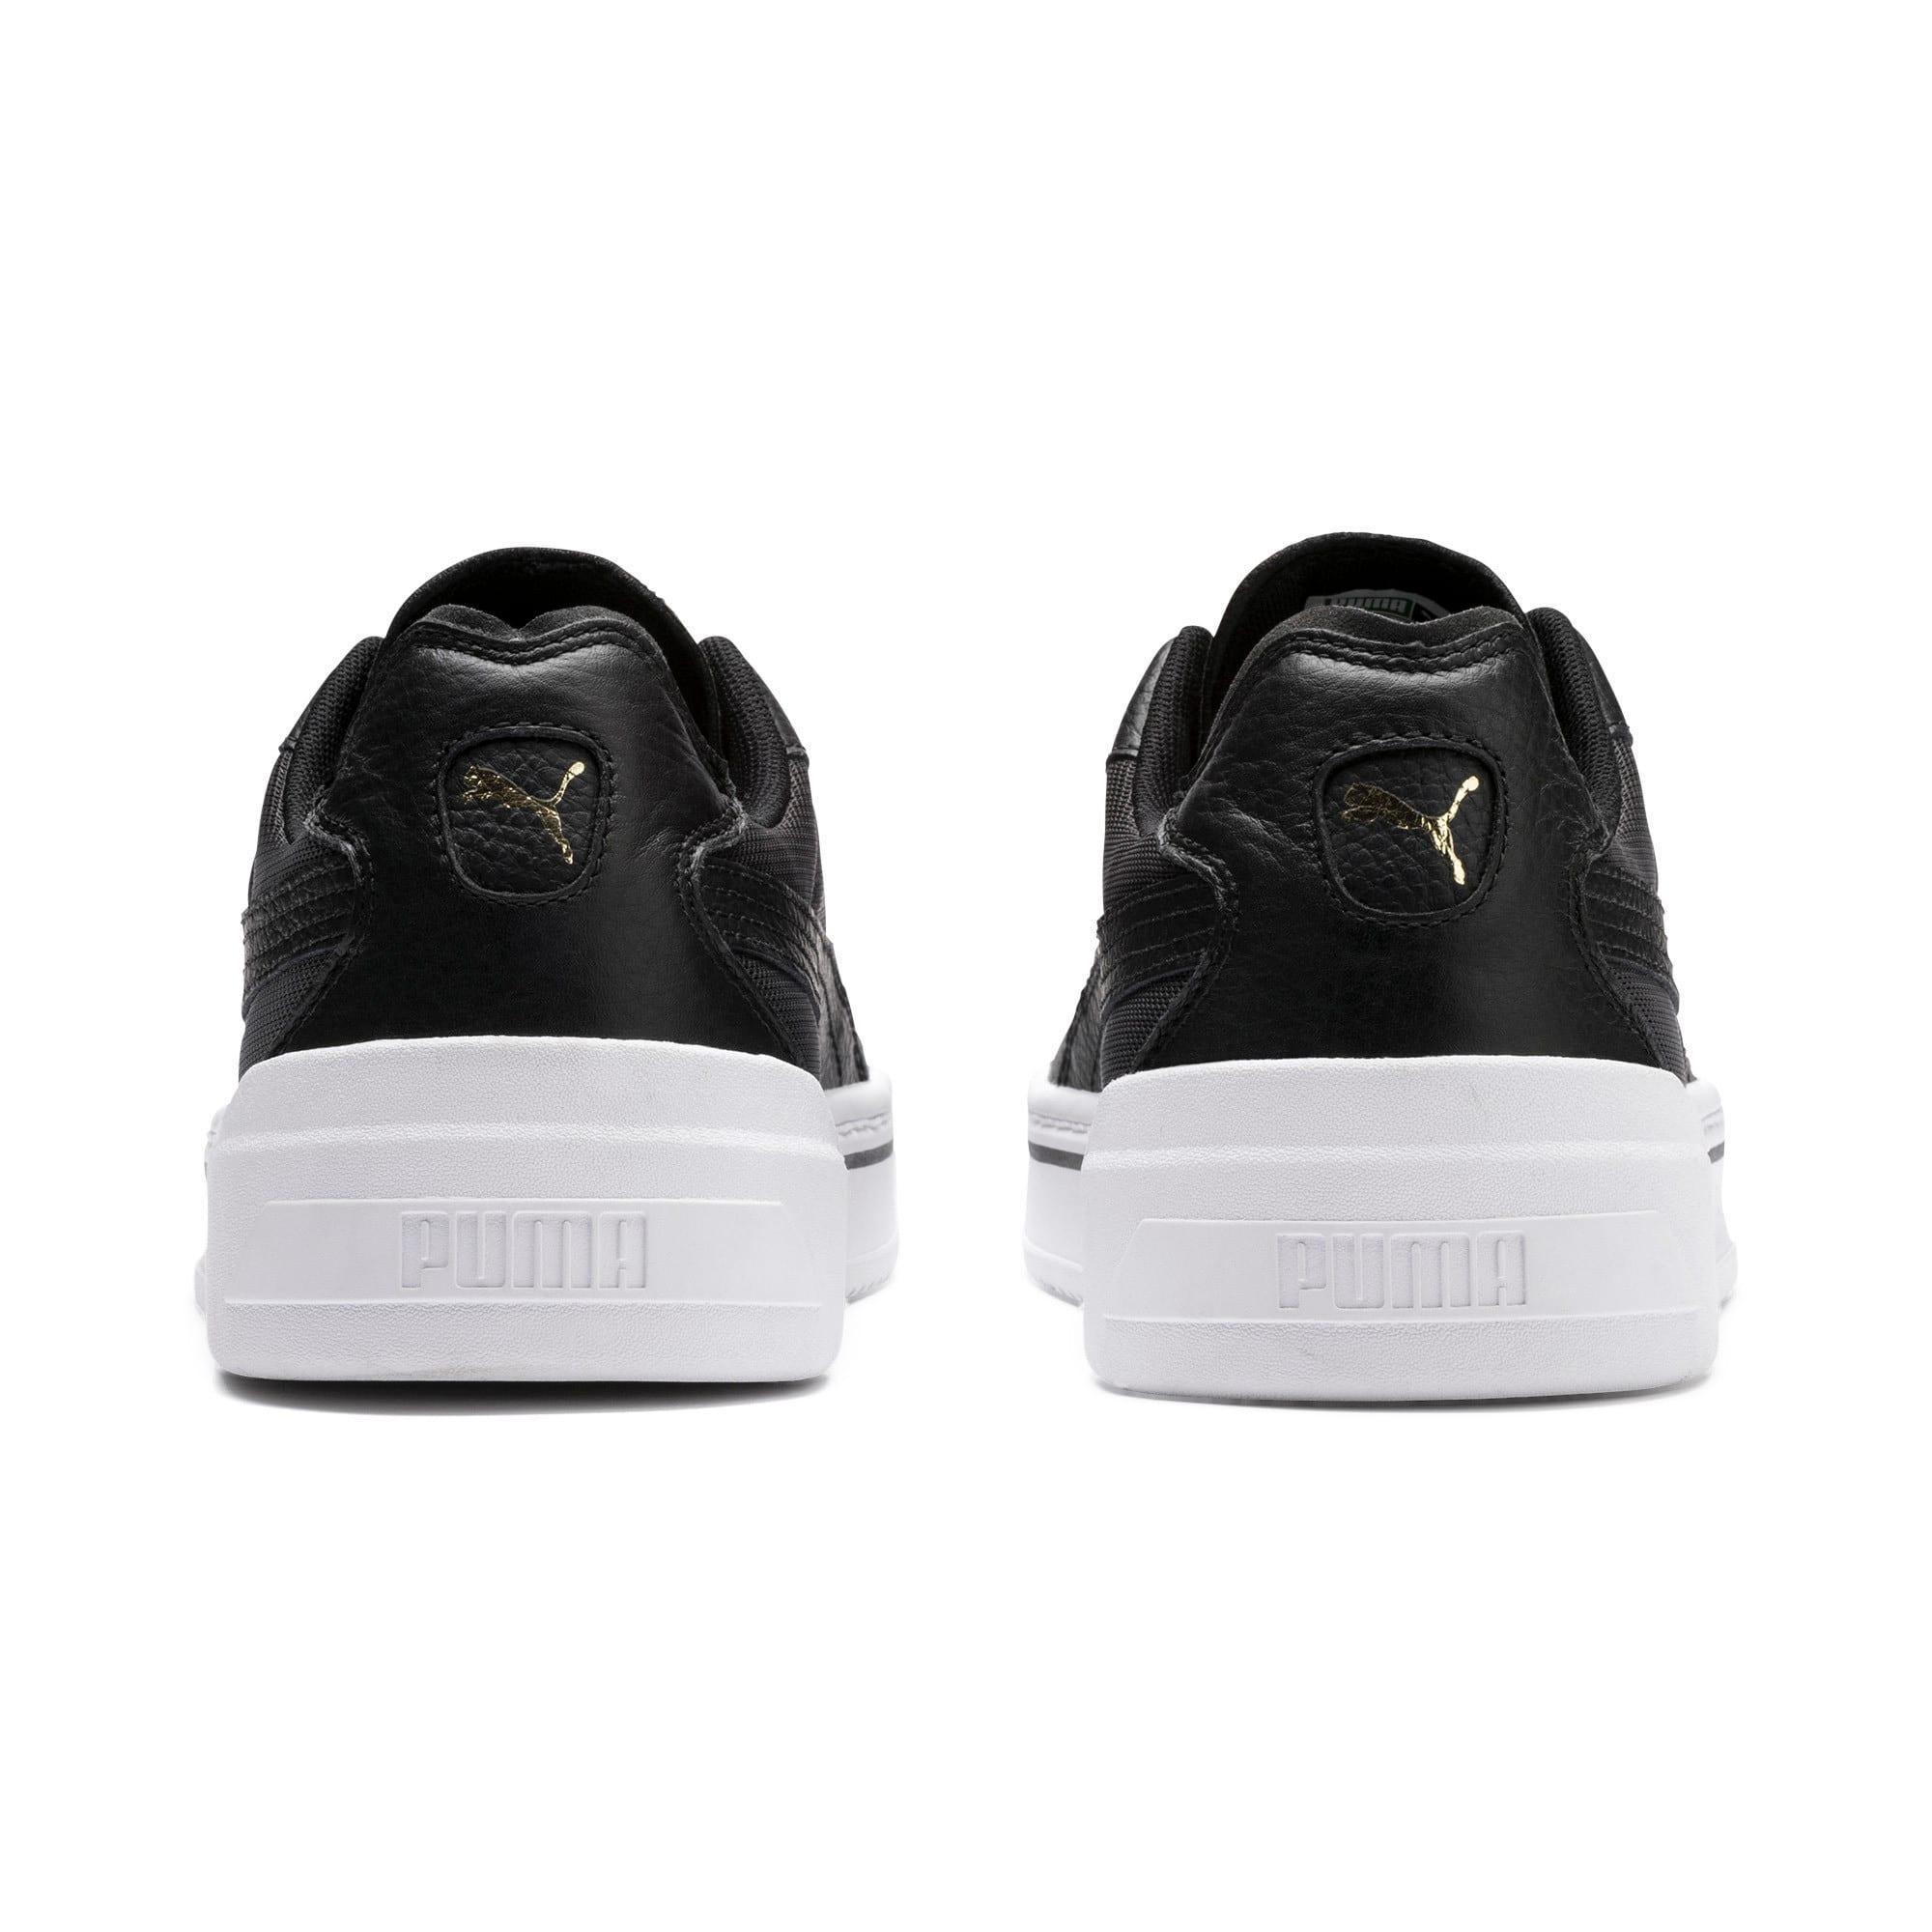 Thumbnail 4 of Cali-0 Sneakers, Puma Black-Puma Blk-Puma Wht, medium